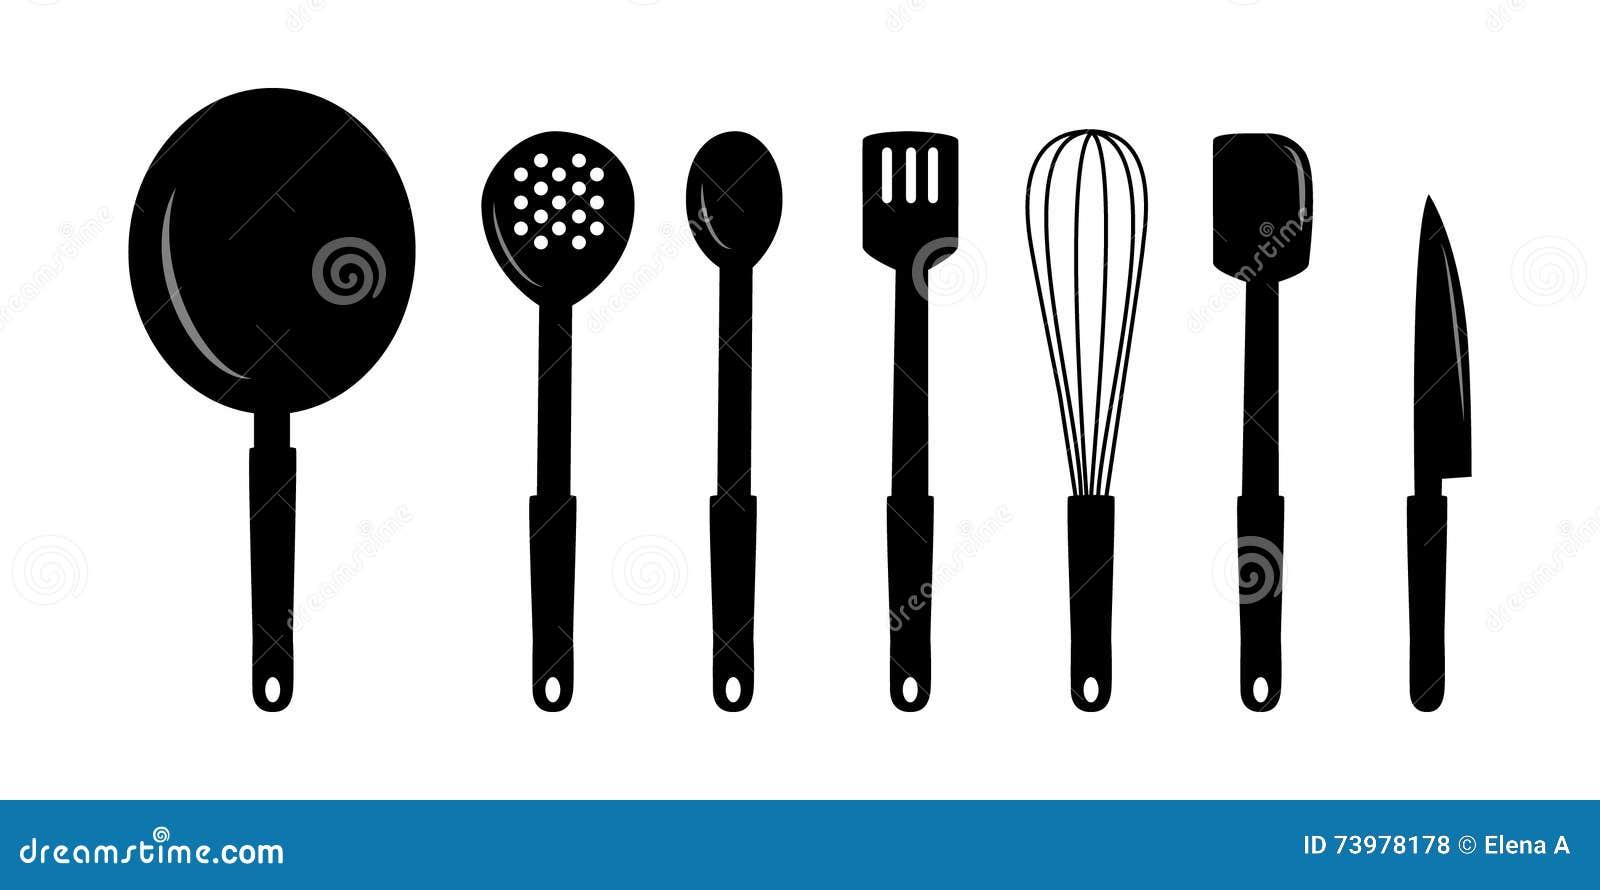 Kitchen Utensils Art kitchen utensils art stock vector - image: 73978178